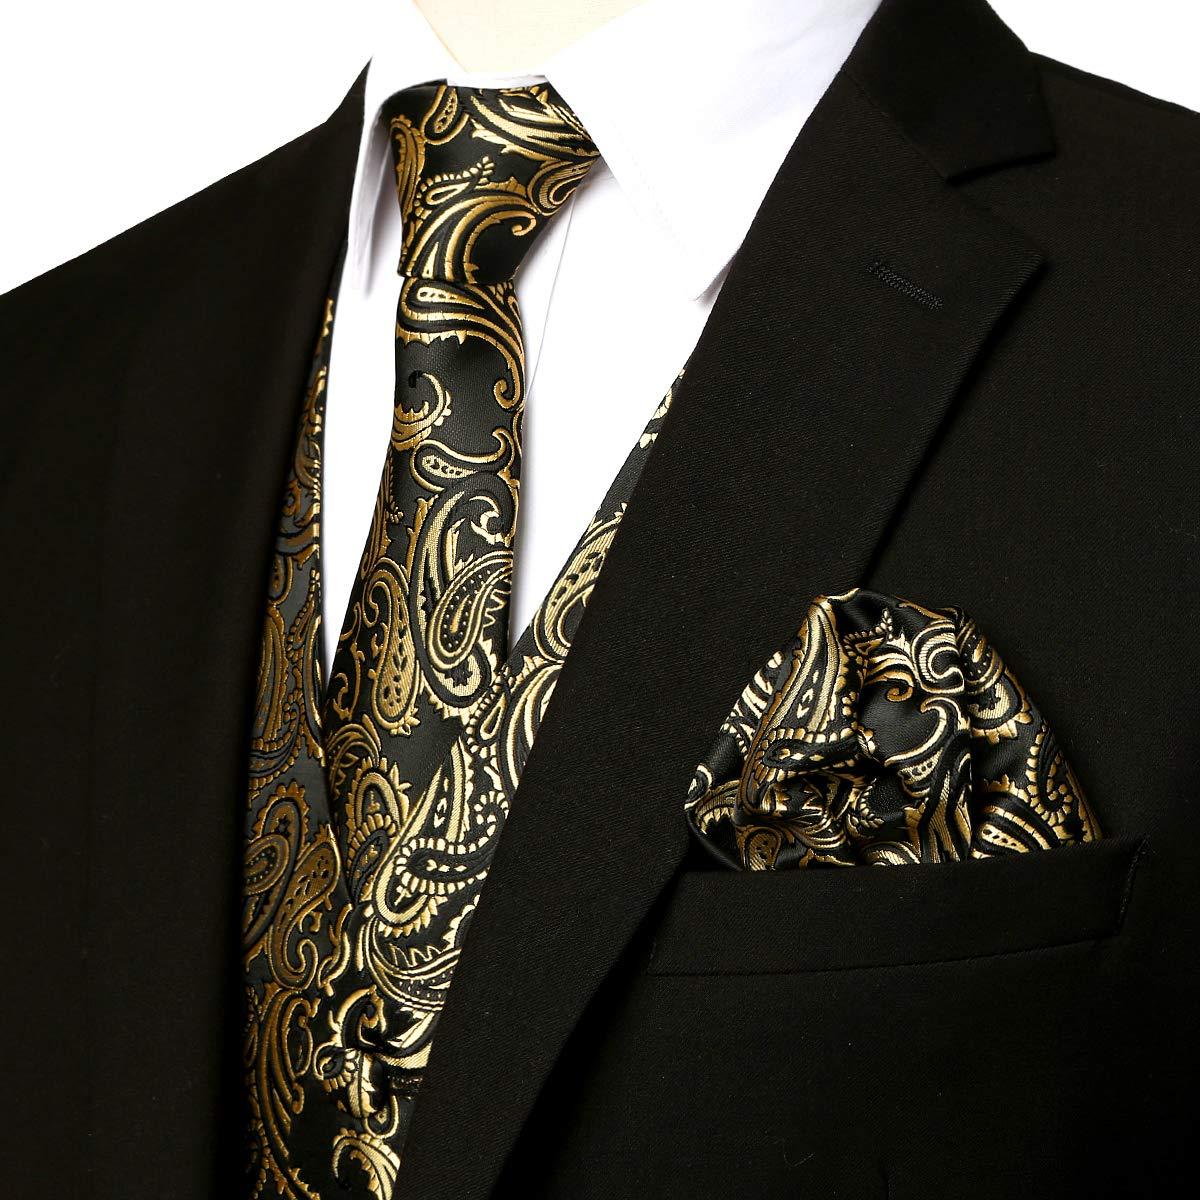 ZEROYAA Men's 3pc Paisley Jacquard Vest Set Necktie Pocket Square Set for Suit or Tuxedo ZLSV14 Gold Black Large by ZEROYAA